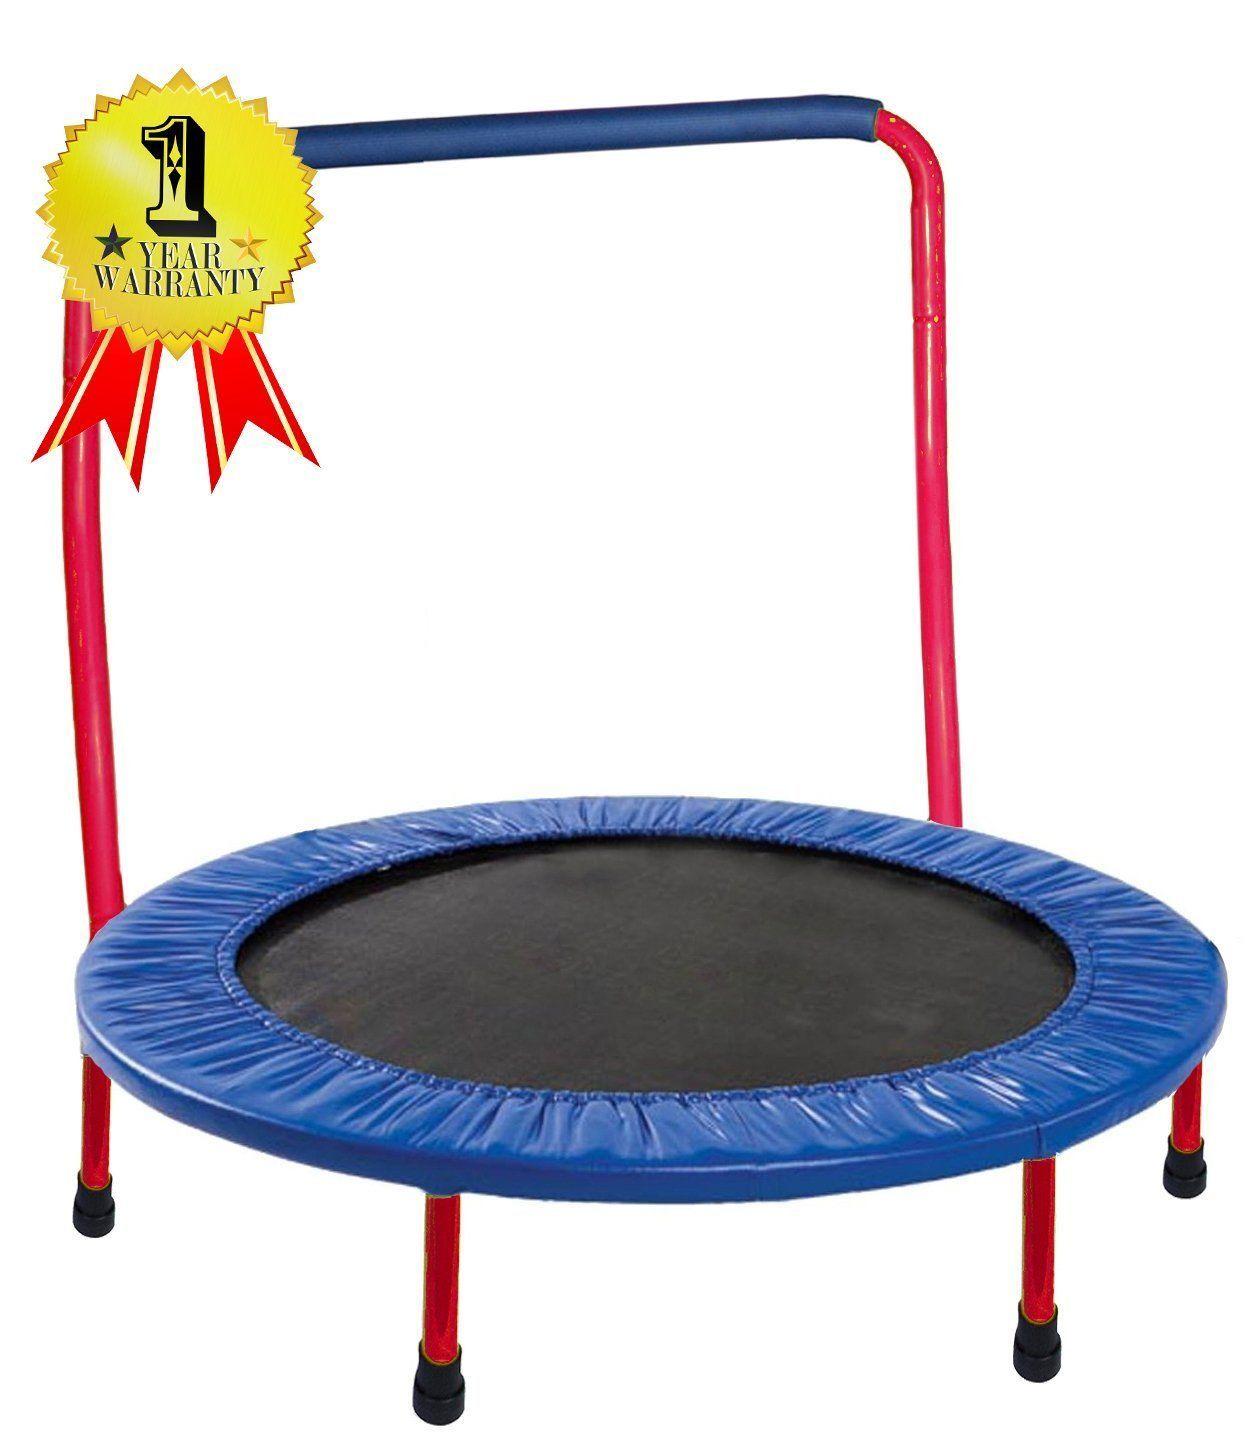 Best mini trampoline for kids